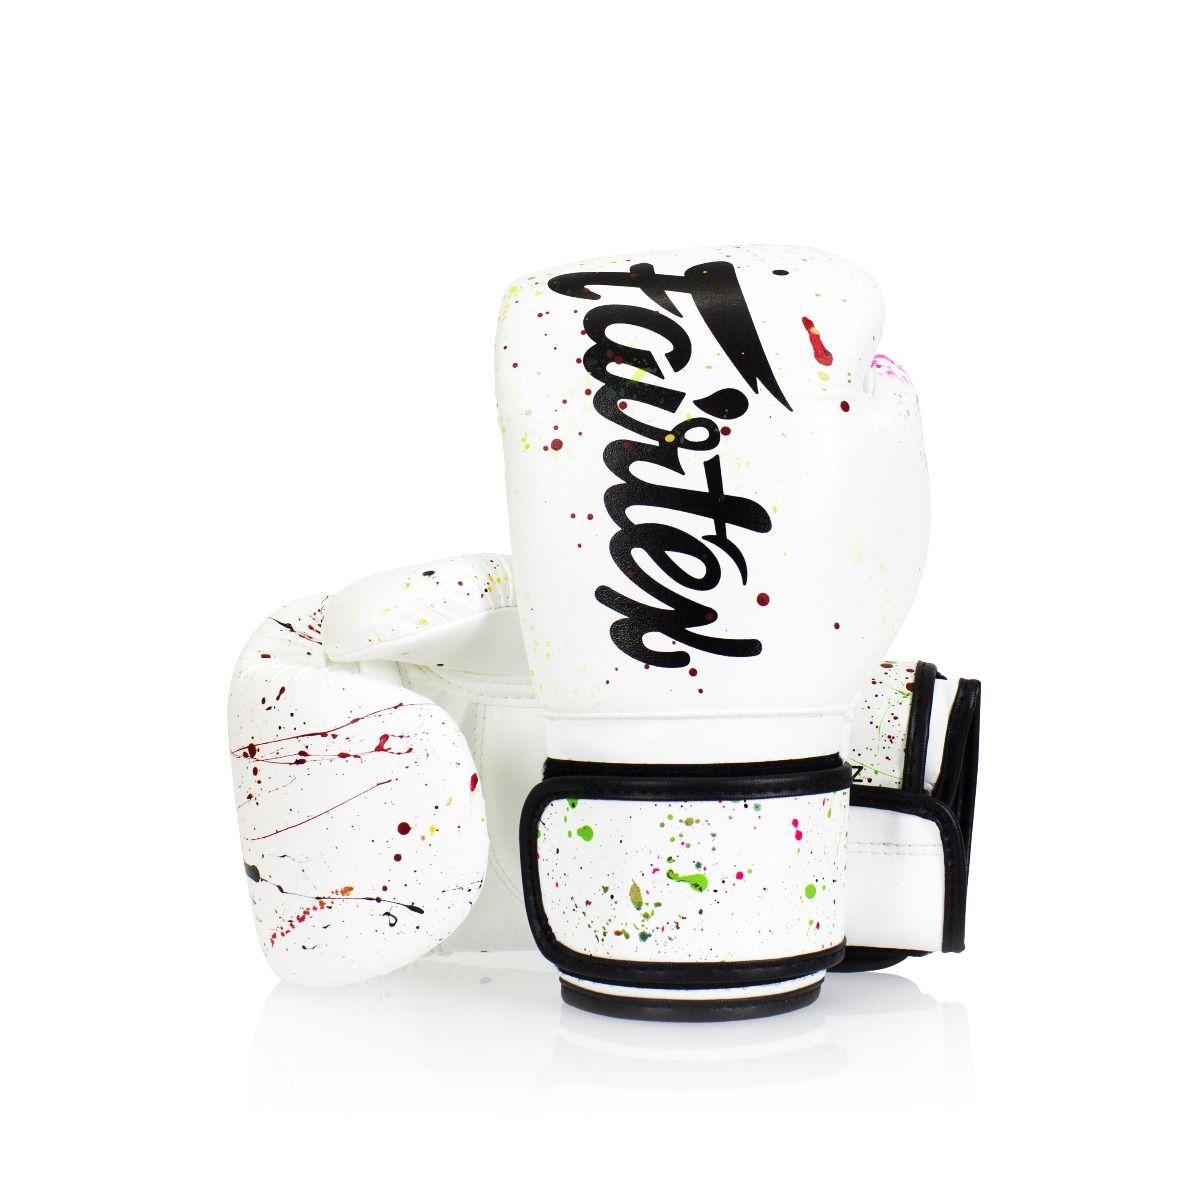 FAIRTEX Microfiber Gloves - Art collections - Painter